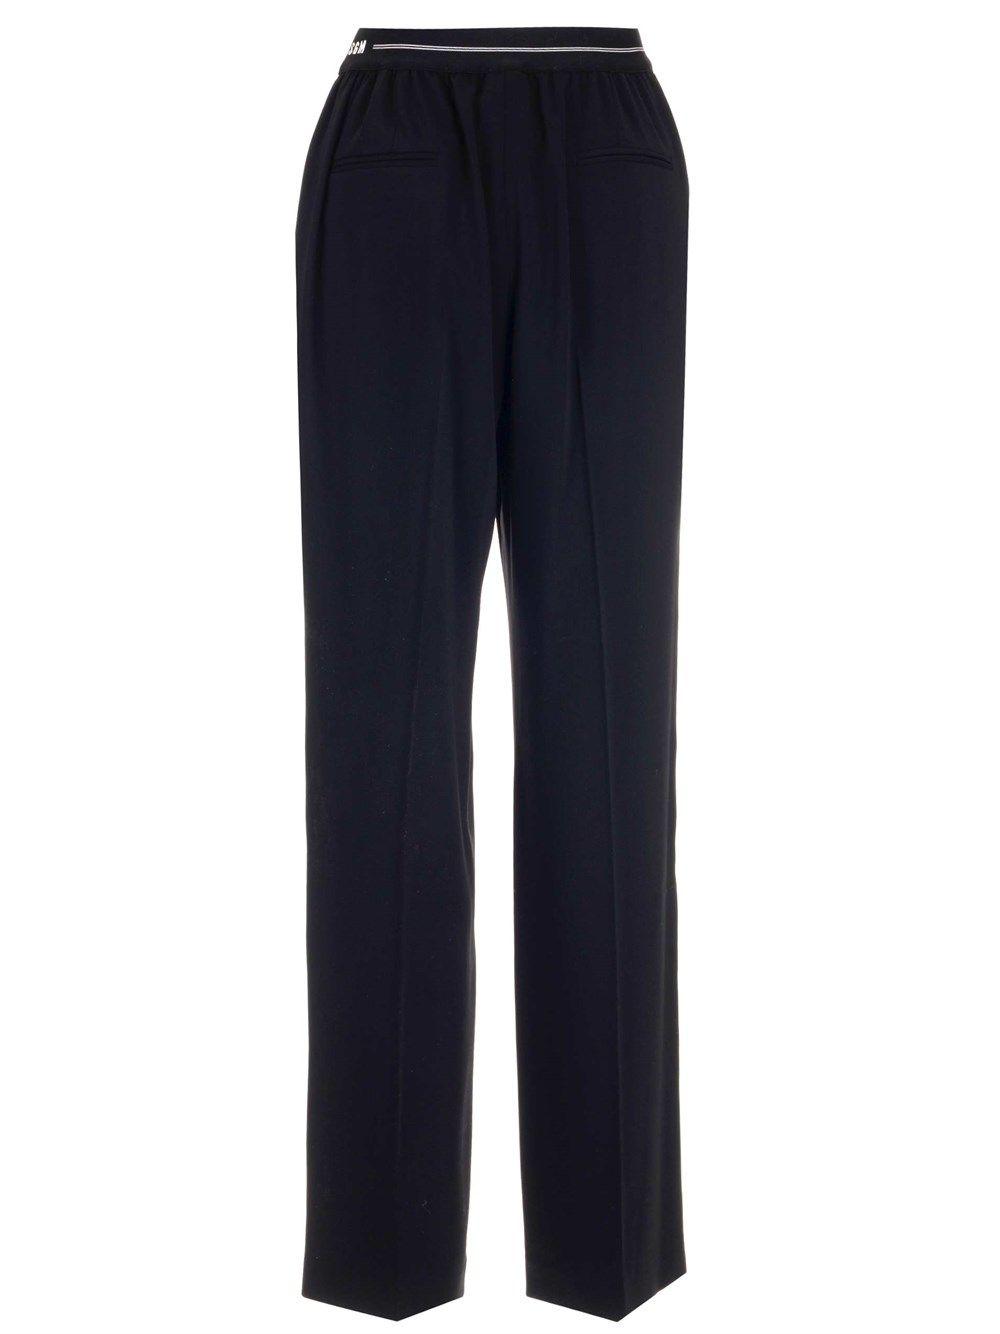 MSGM Pants MSGM WOMEN'S BLACK OTHER MATERIALS PANTS